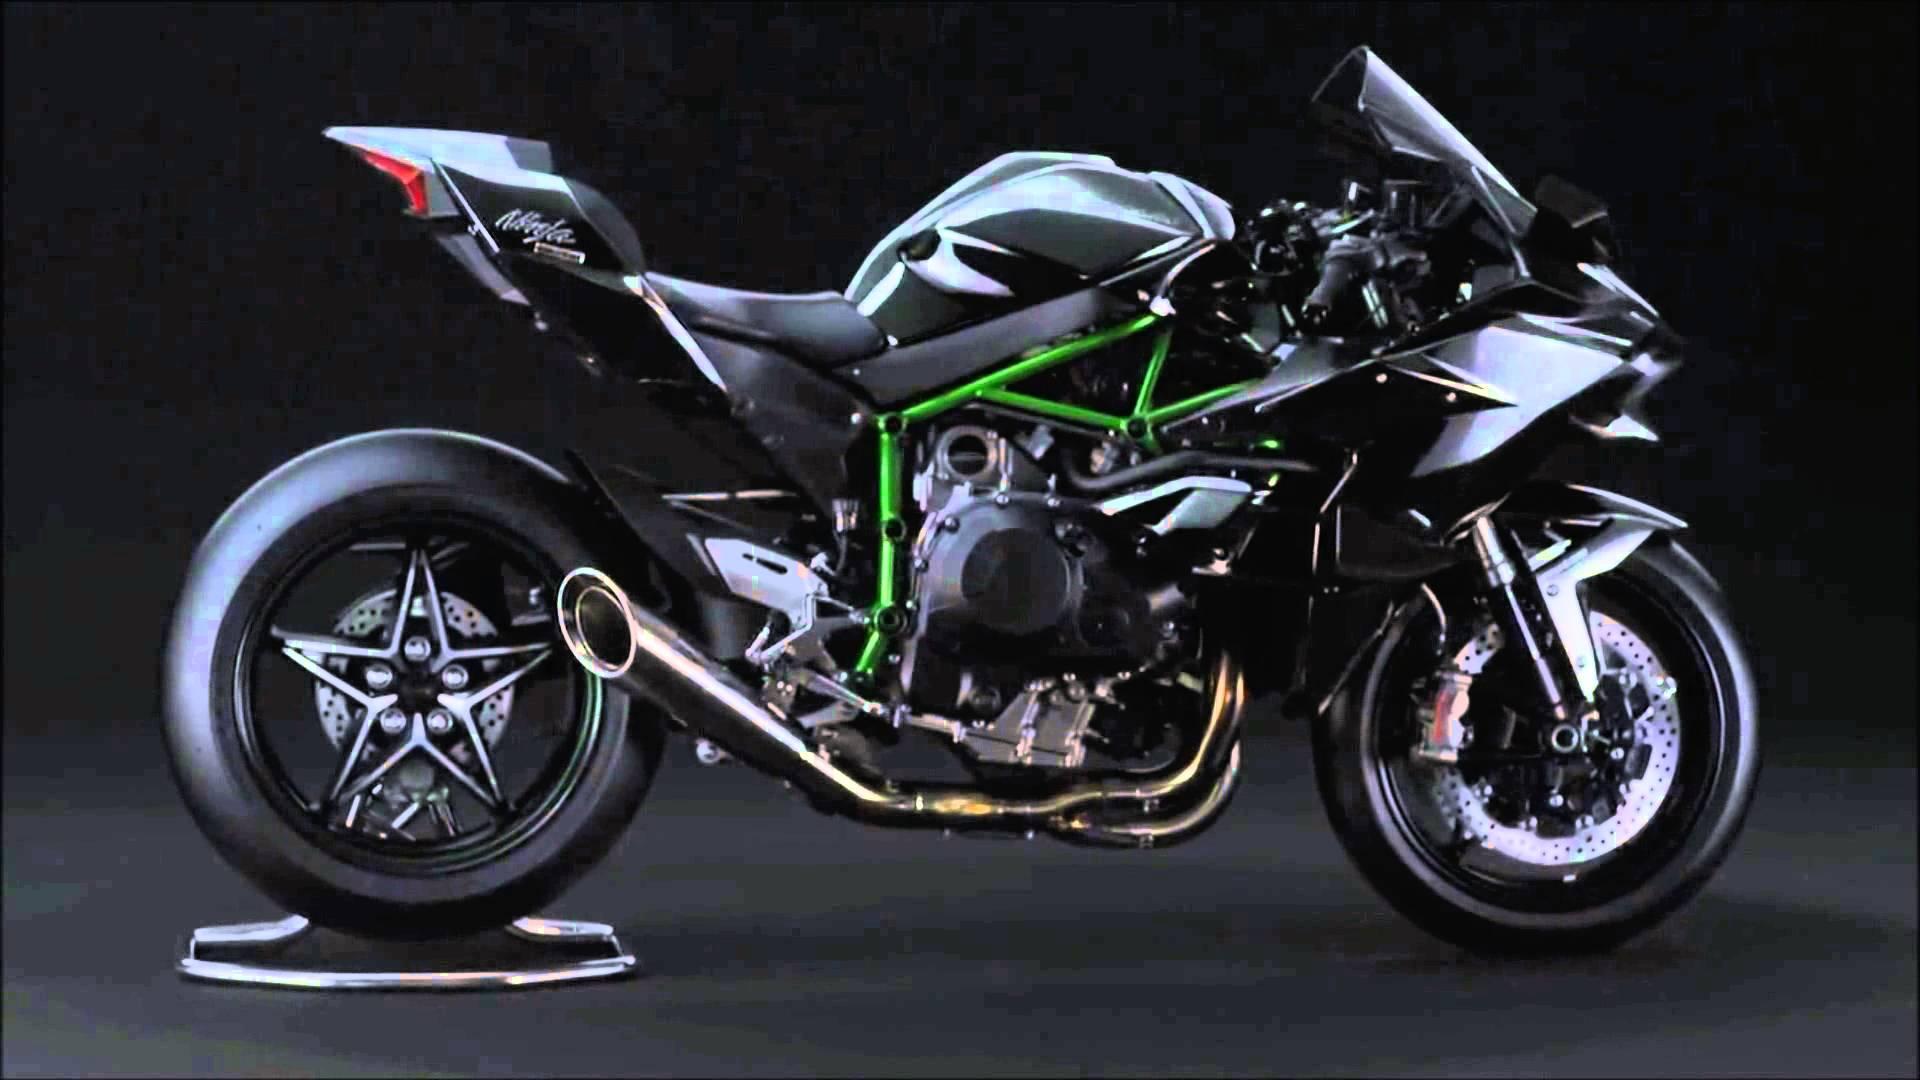 Kawasaki Ninja H2r - Kawasaki Ninja US